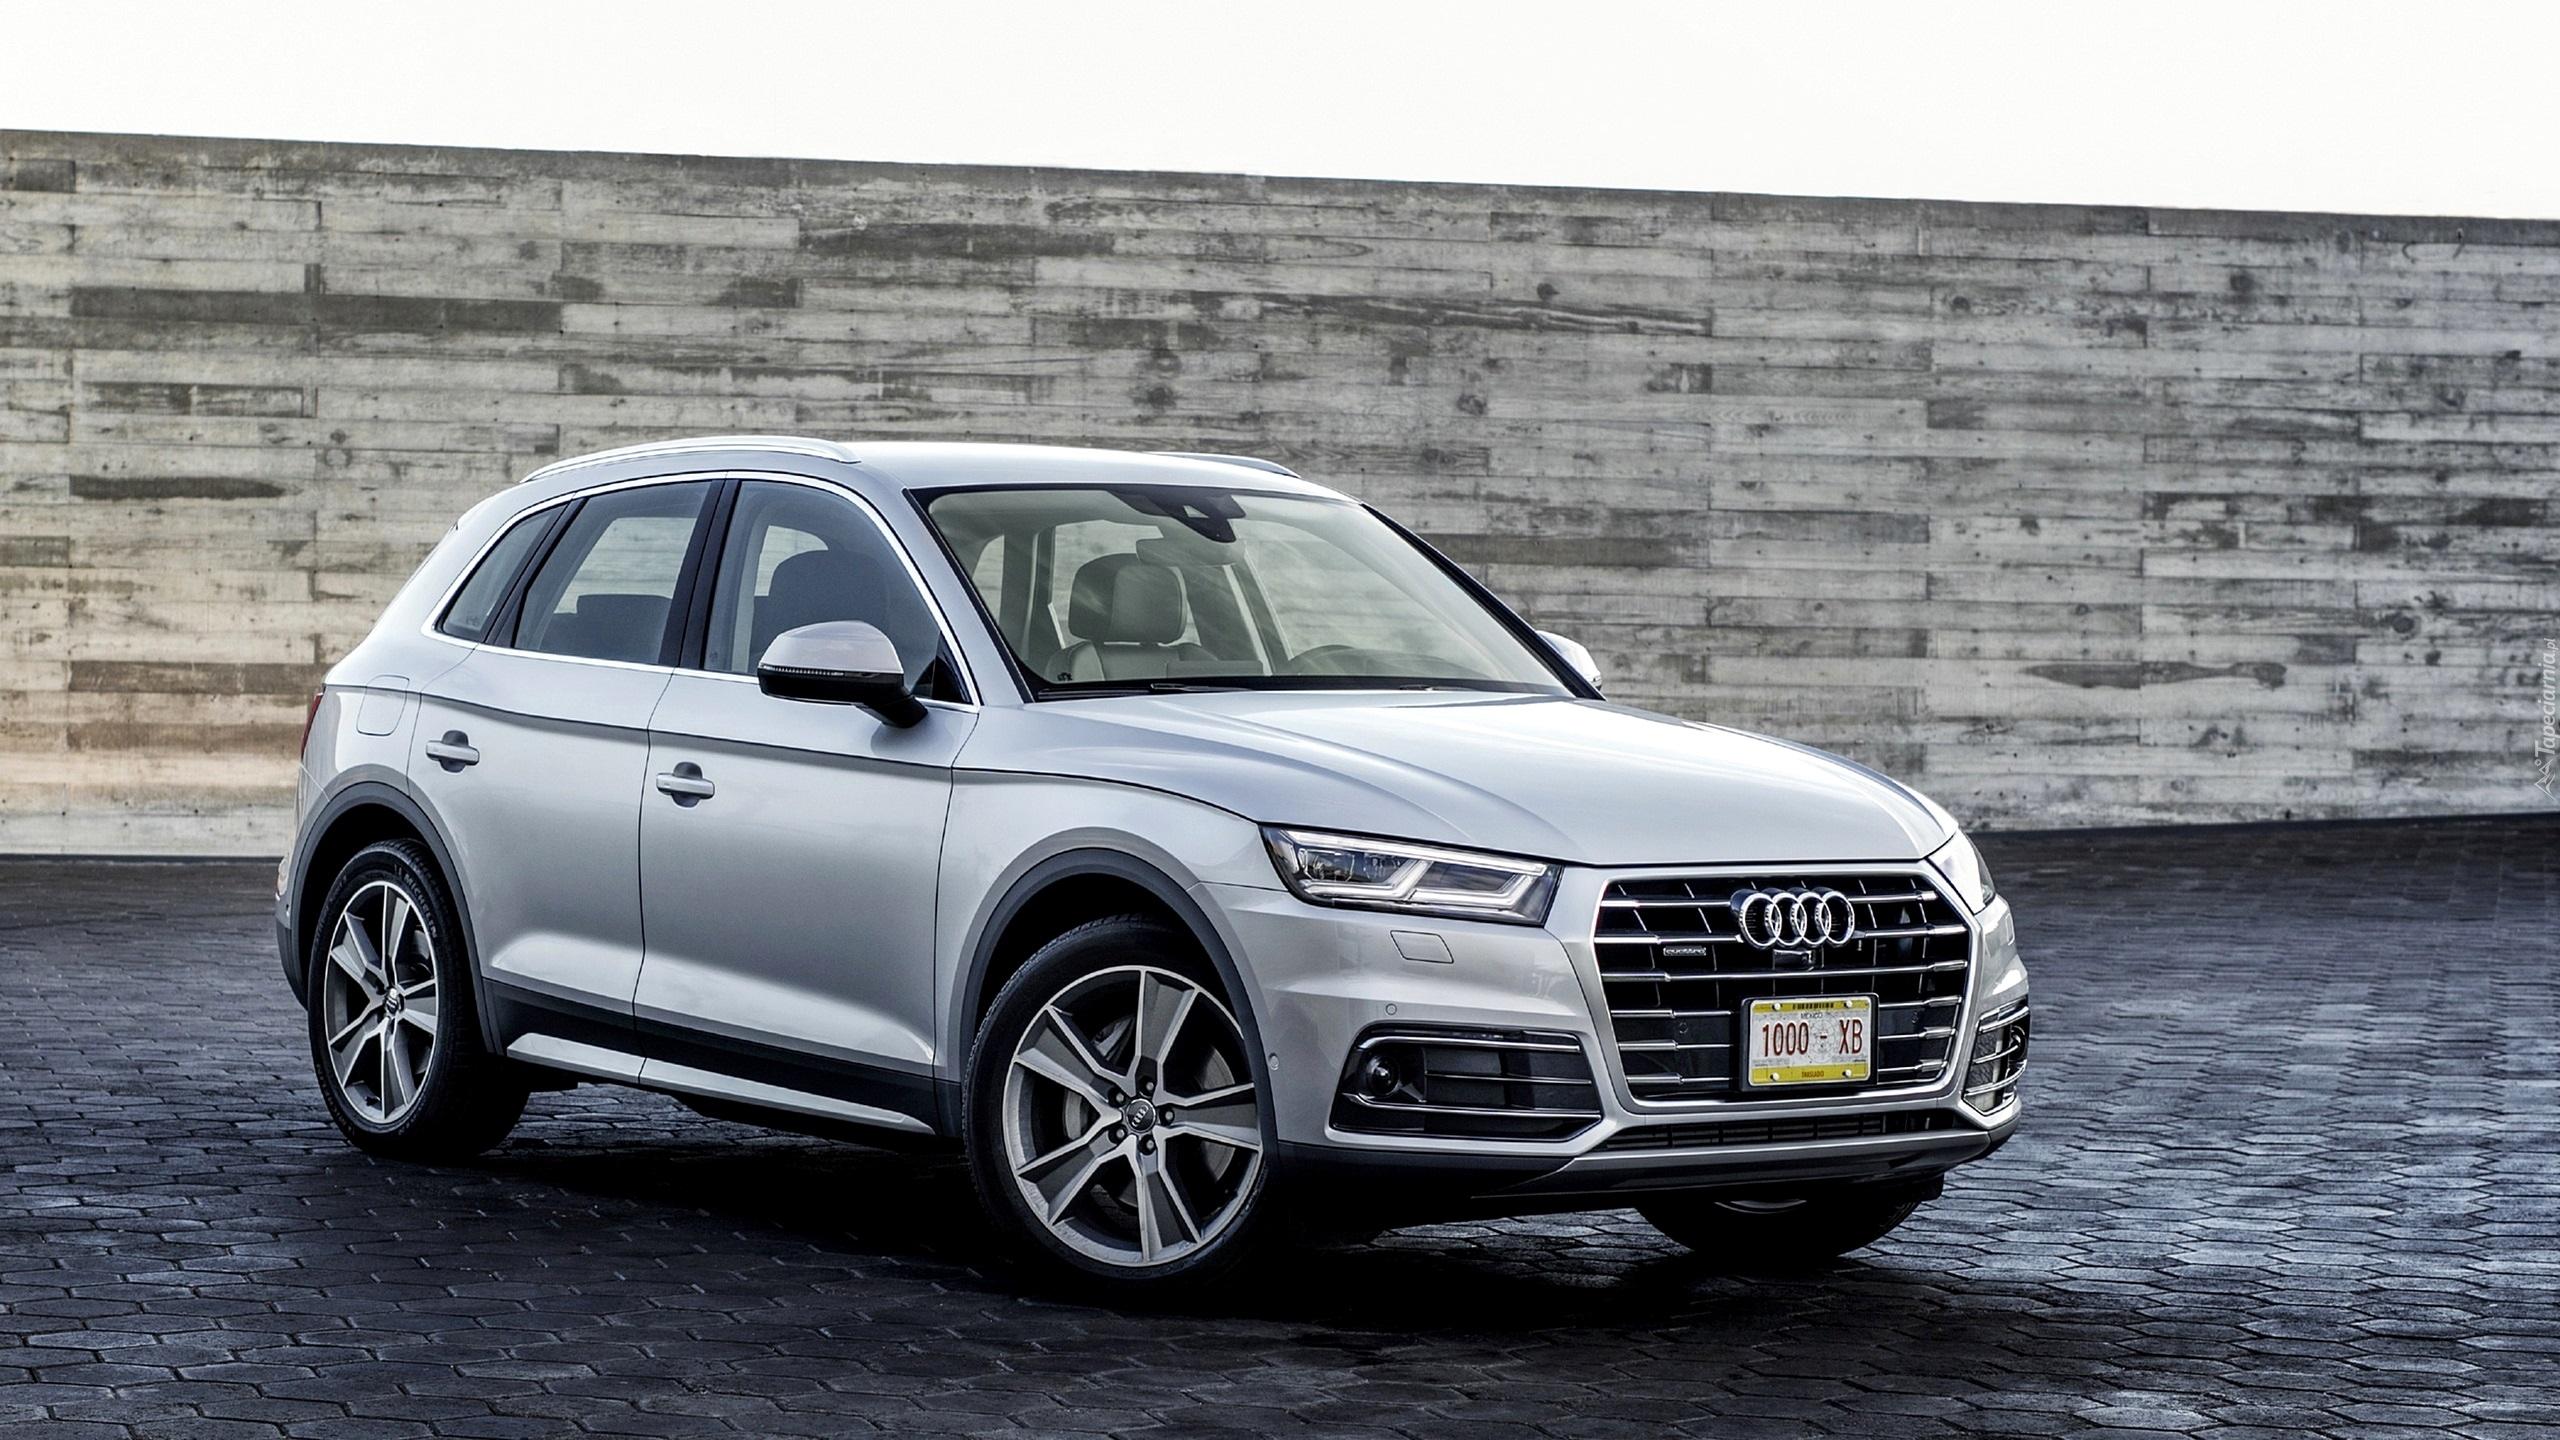 Samochód Audi Q5 rocznik 2017